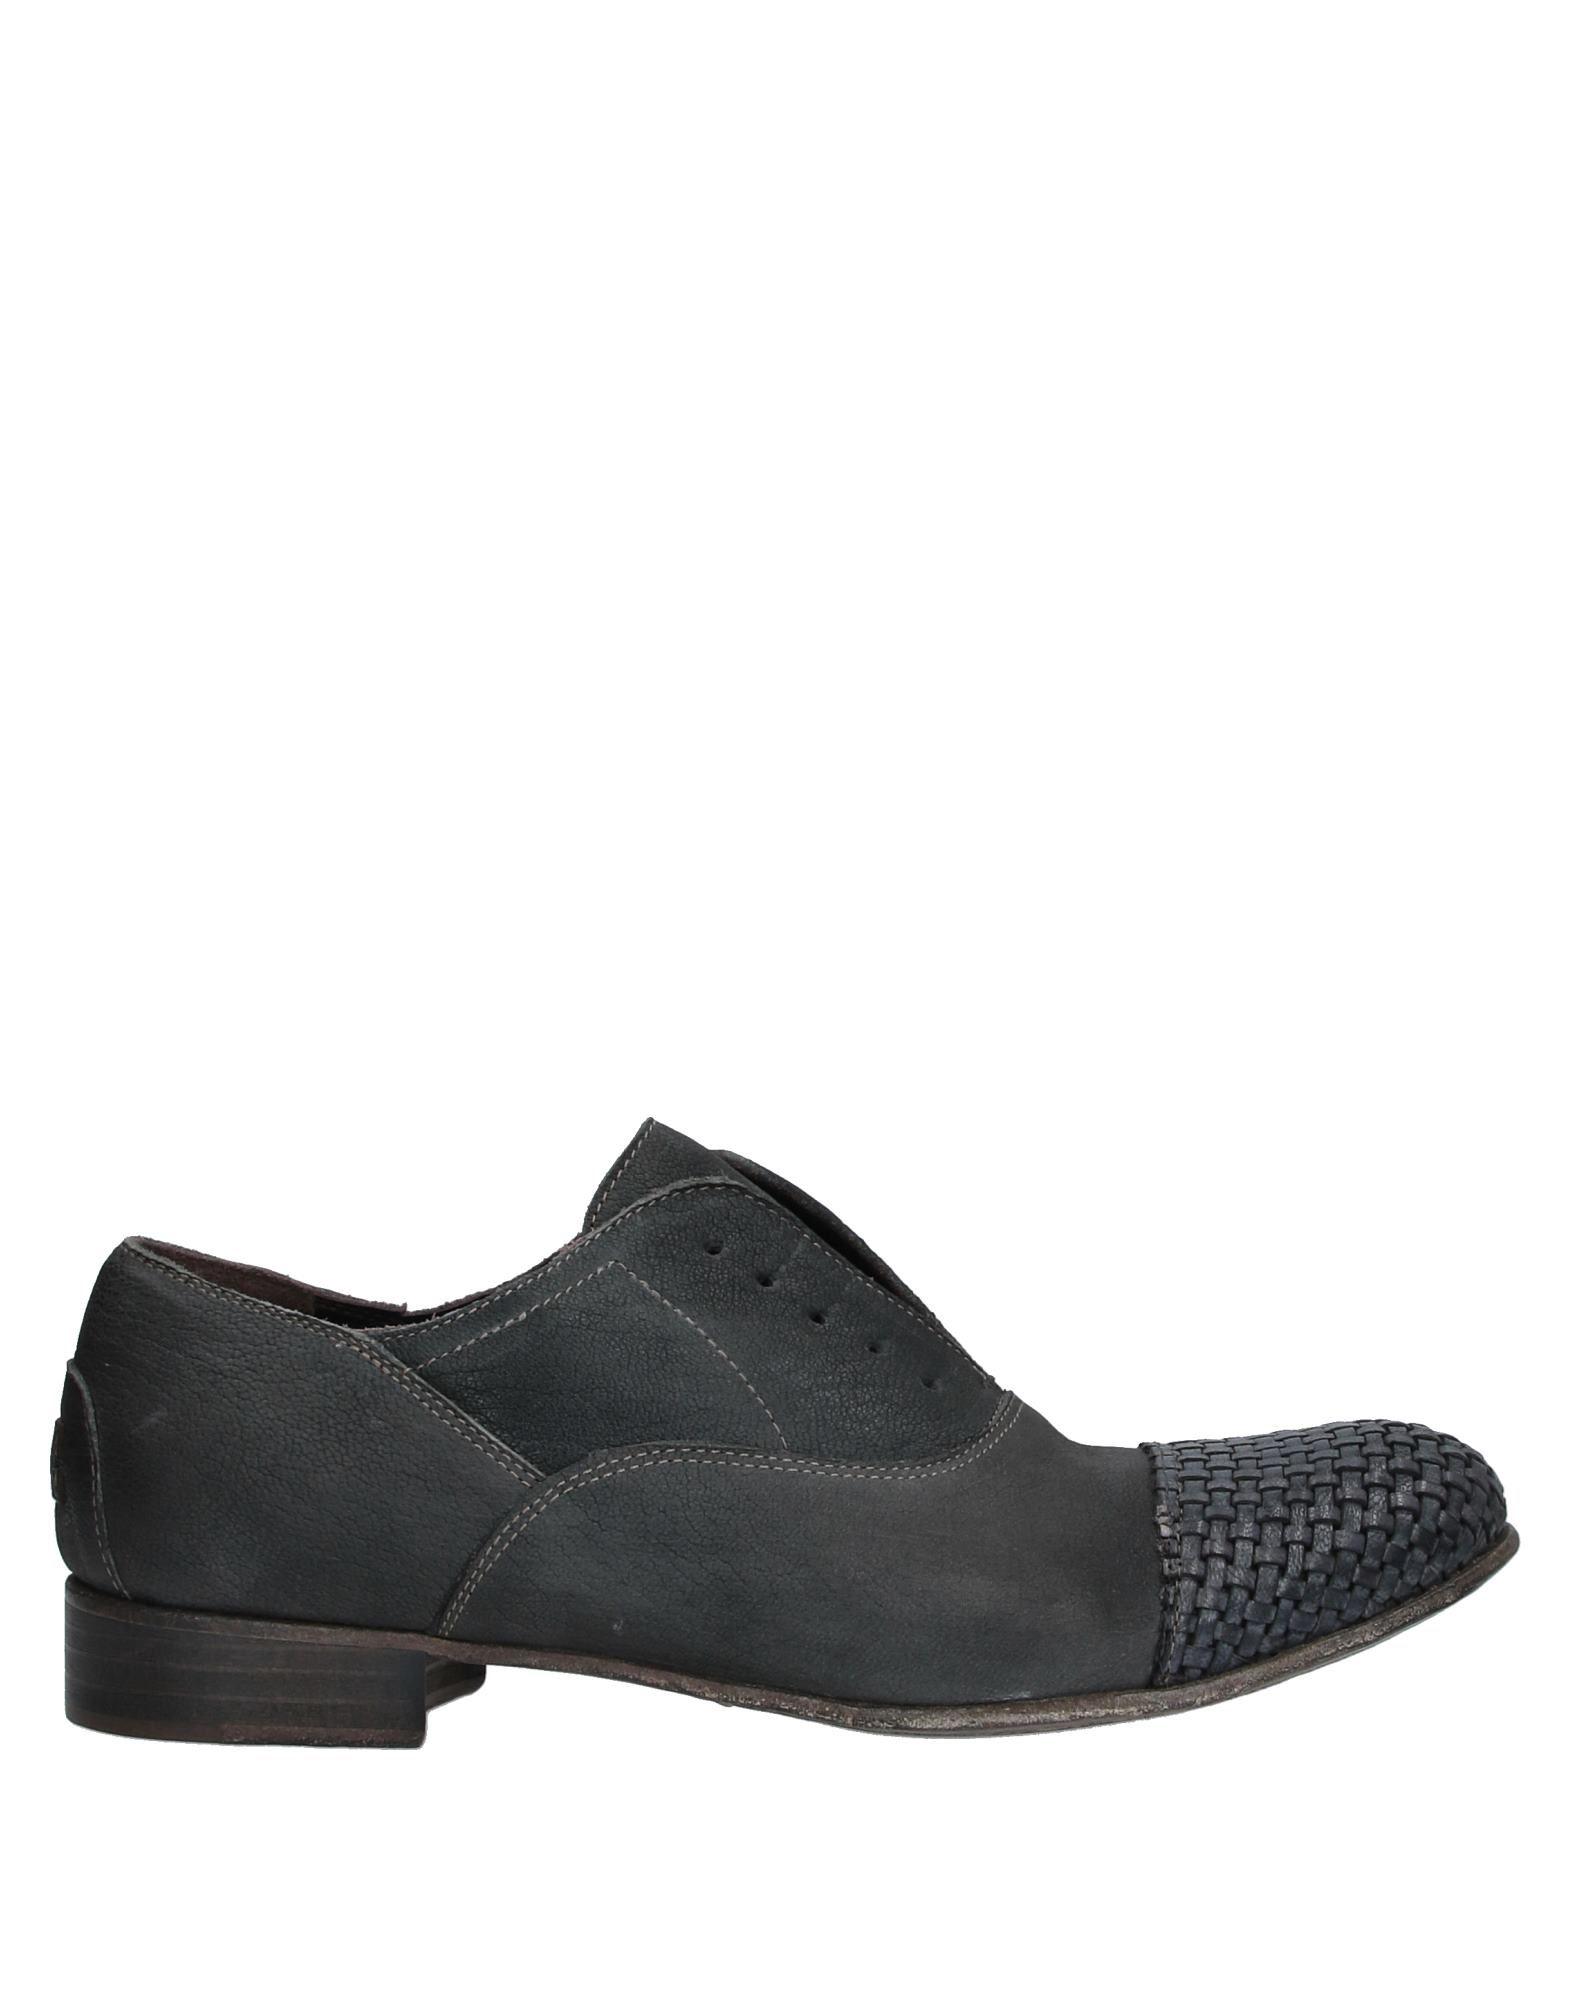 le blanc обувь на шнурках LE RUEMARCEL Обувь на шнурках